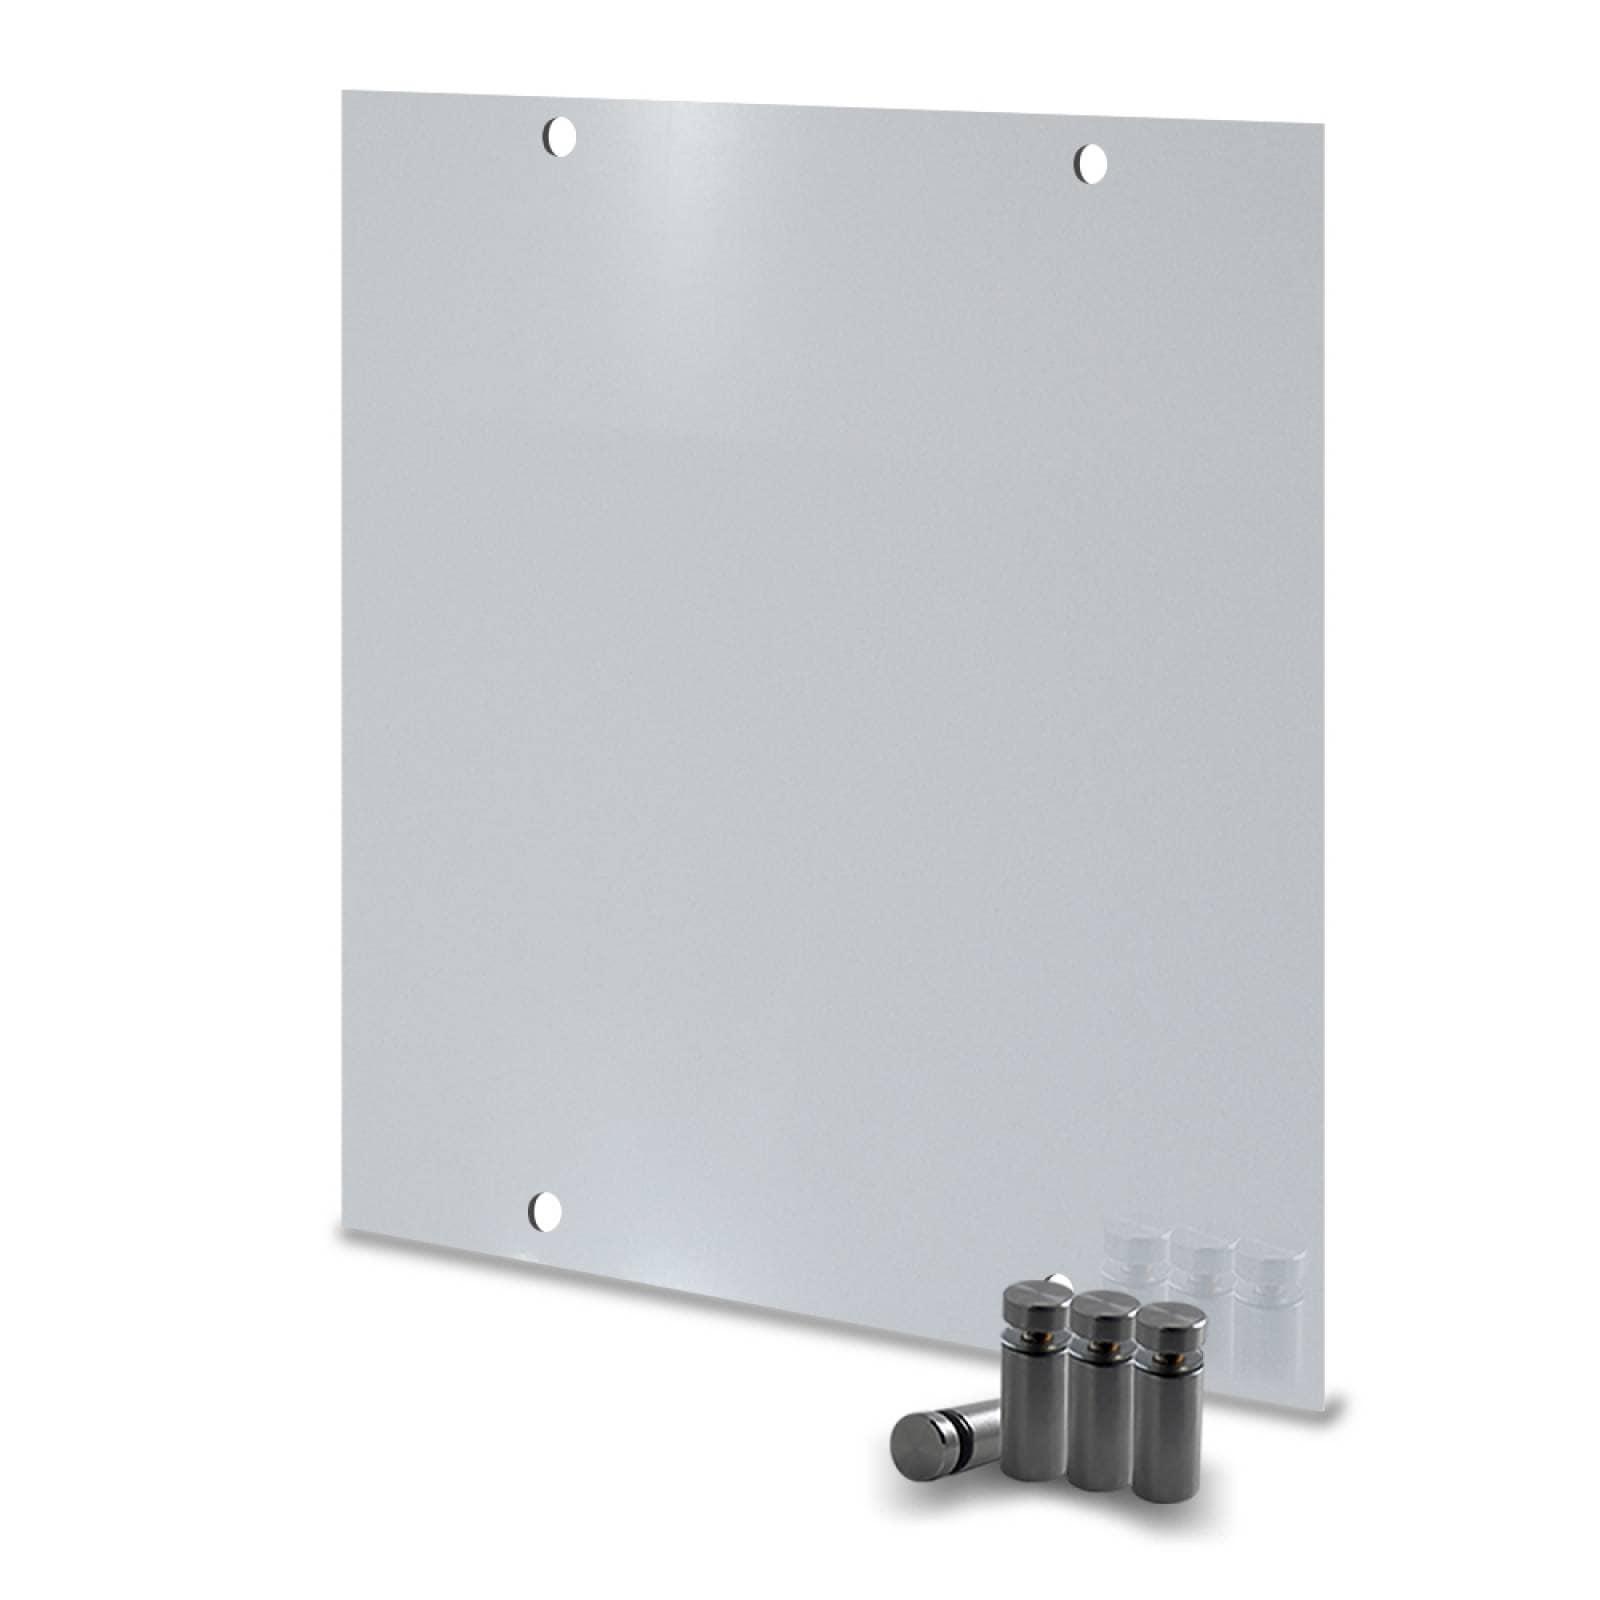 Calefactor de Panel infrarrojo en Aluminio para Techo, Ontario Wave White Cloud de 380W 59x59cm, Mod: 381CaSol-TB